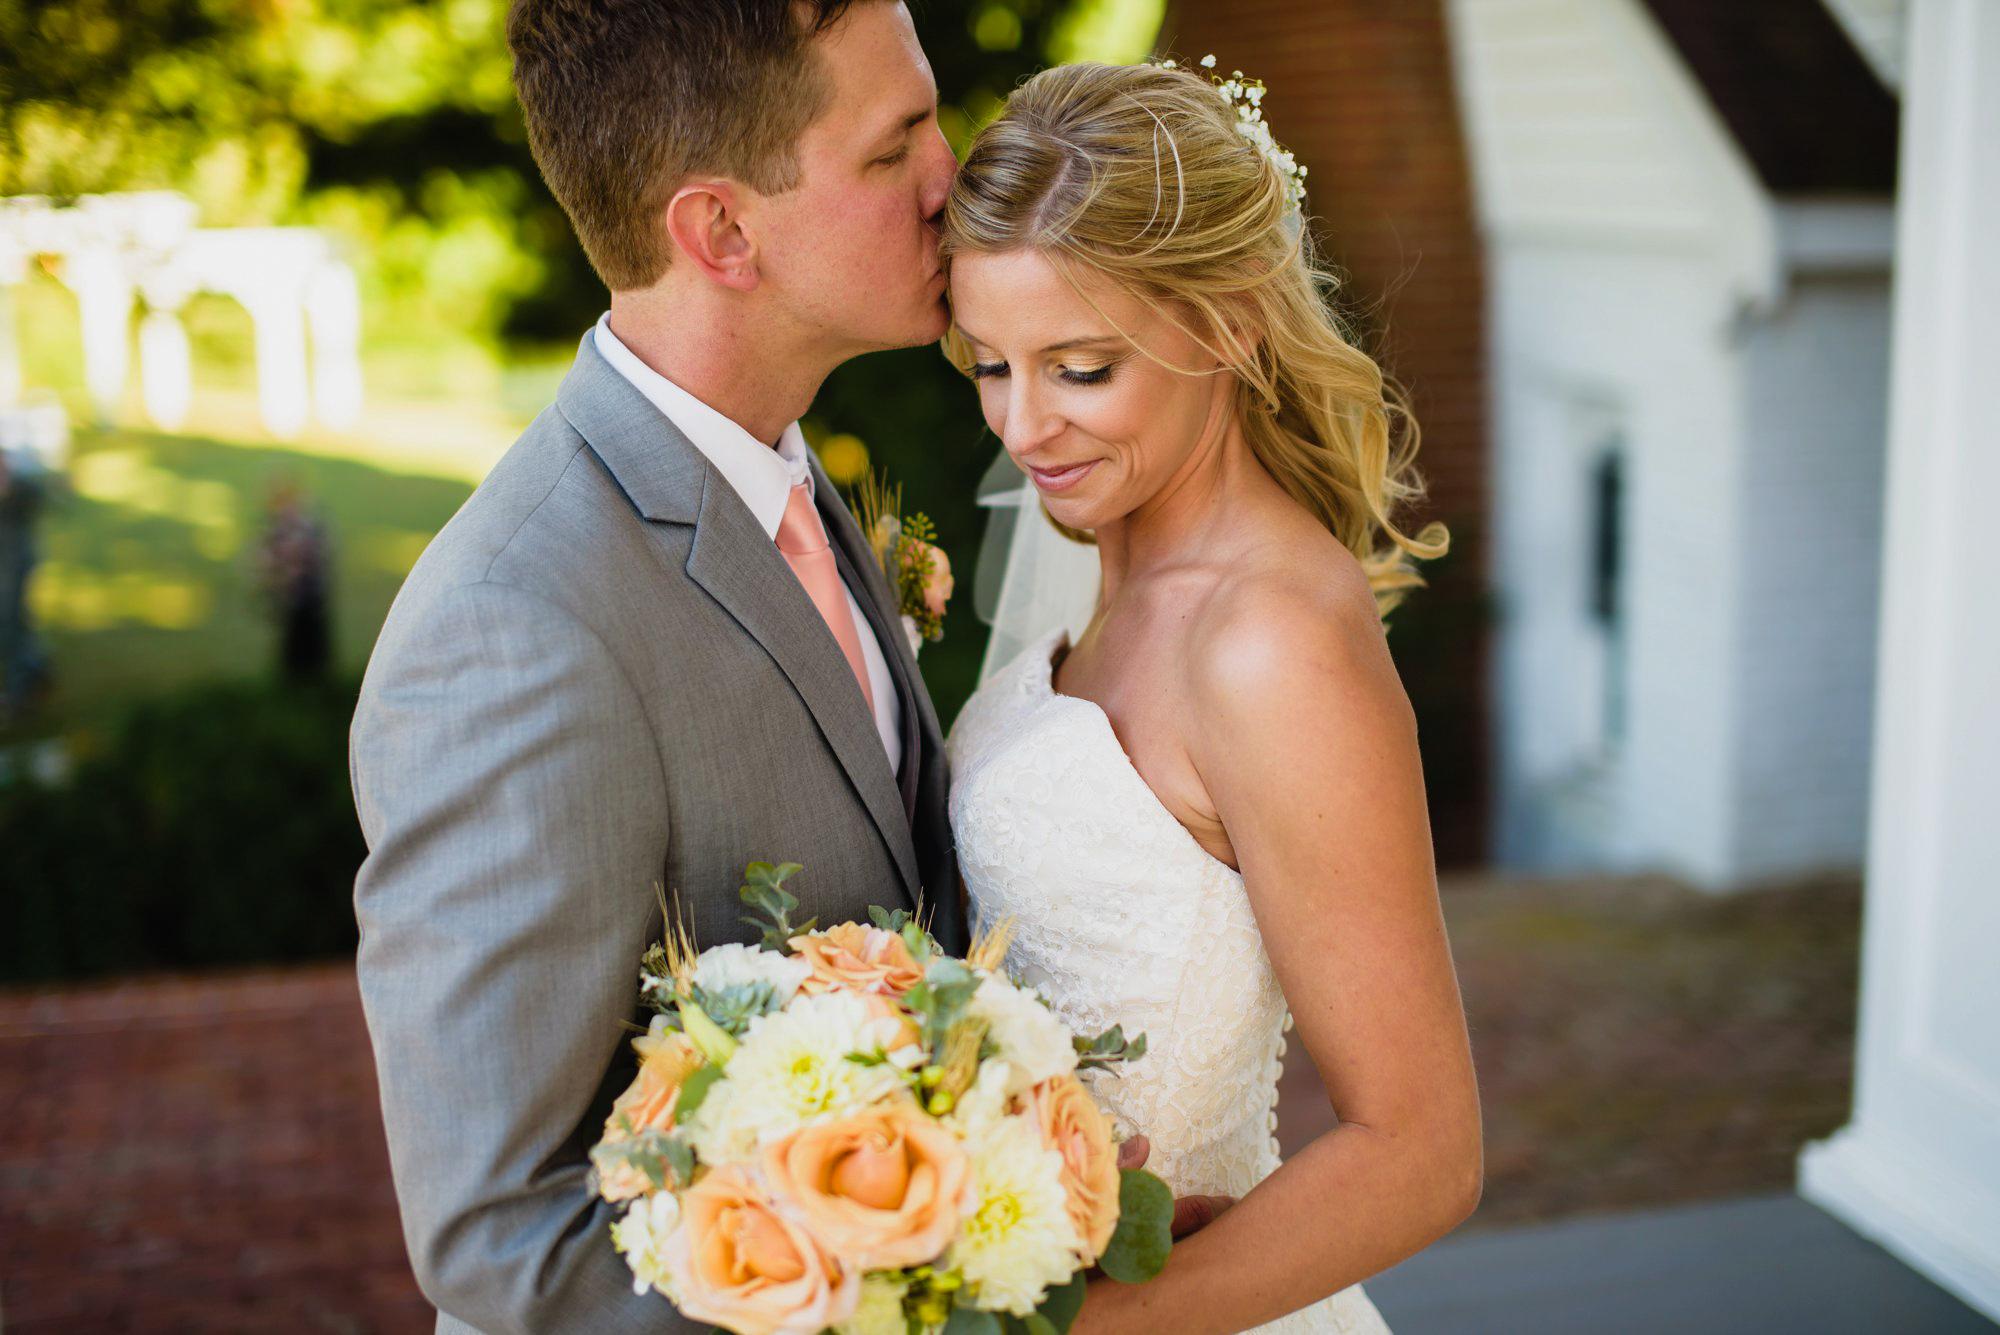 wedding-photography-virginia_0040.jpg